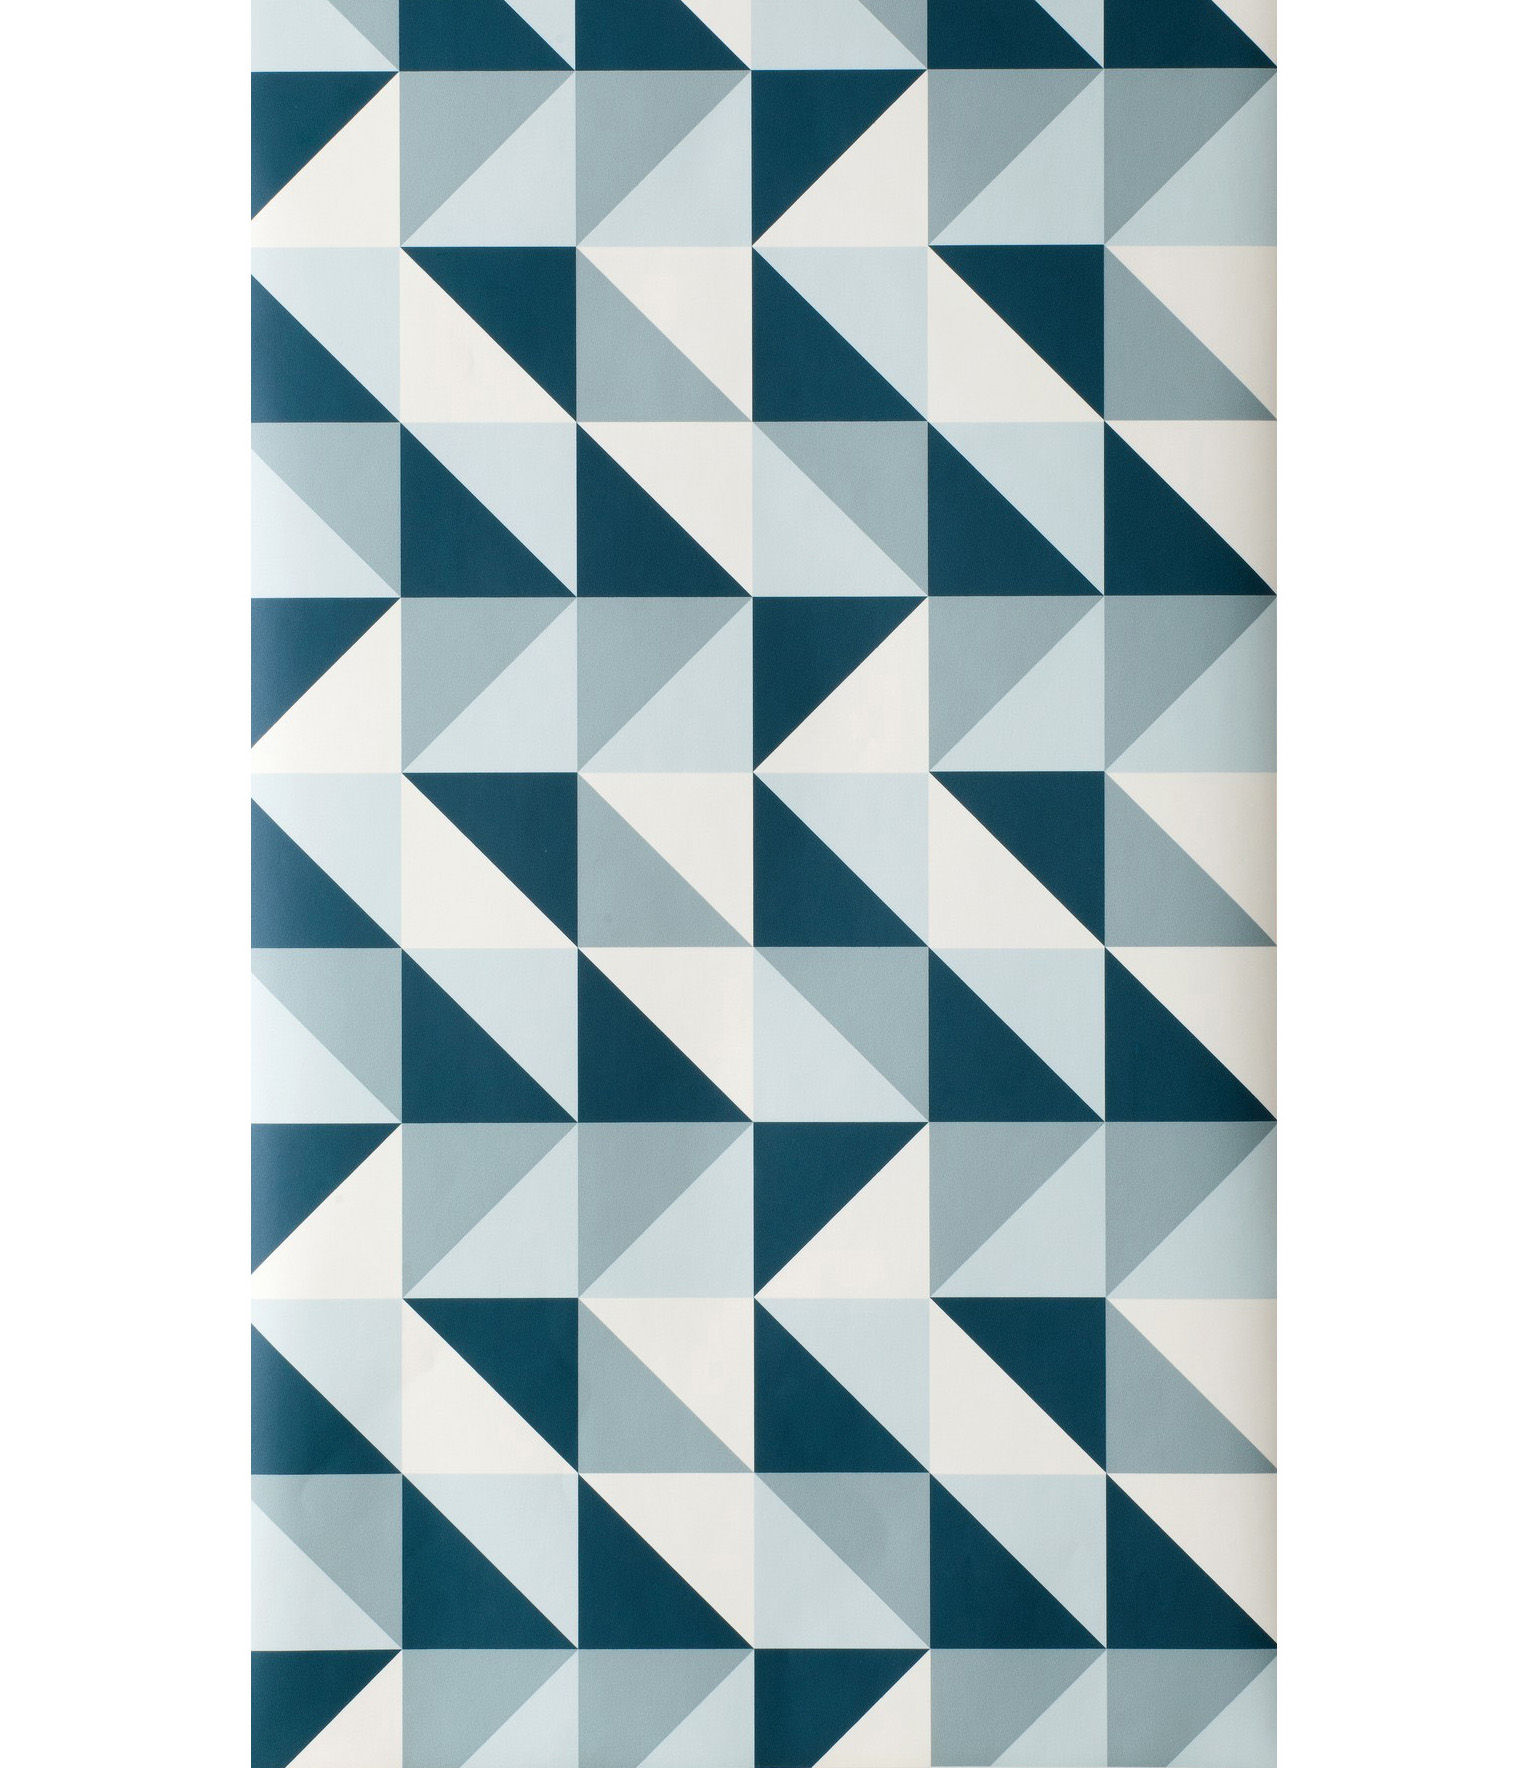 carta da parati remix 1 rotolo ferm living bianco verde blu petrolio ebay. Black Bedroom Furniture Sets. Home Design Ideas